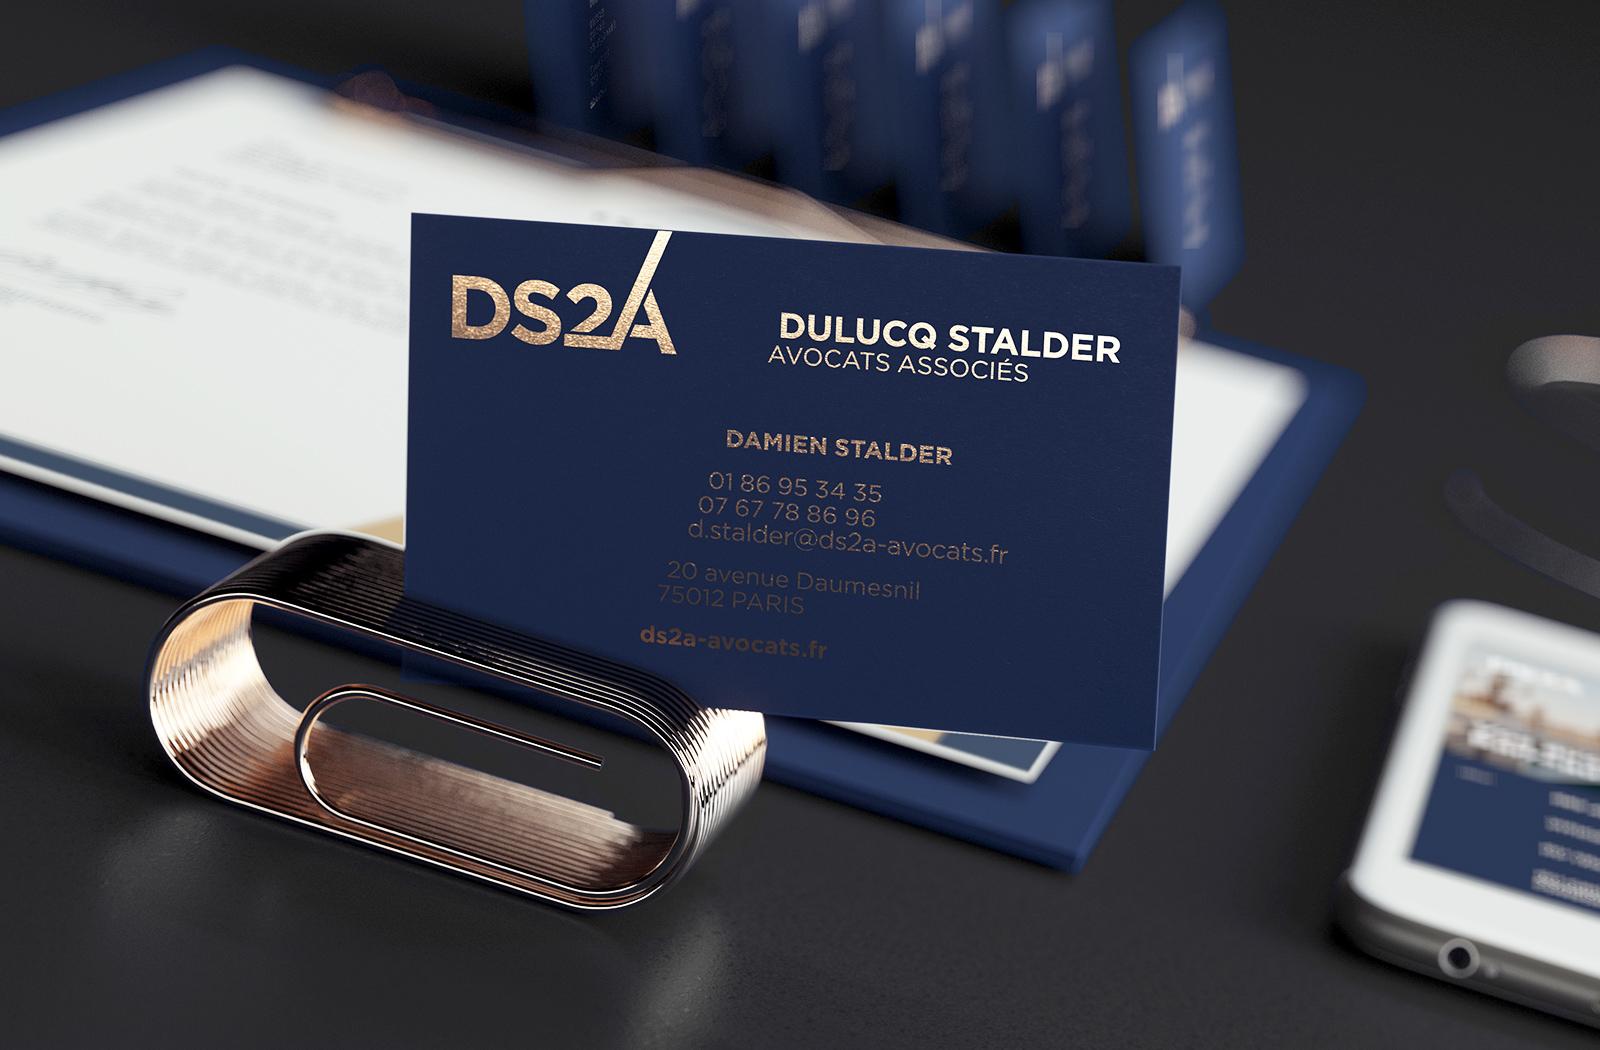 DS2A-Dulucq-stalder-avocats-branding-josselin-tourette-carte-de-visite-4